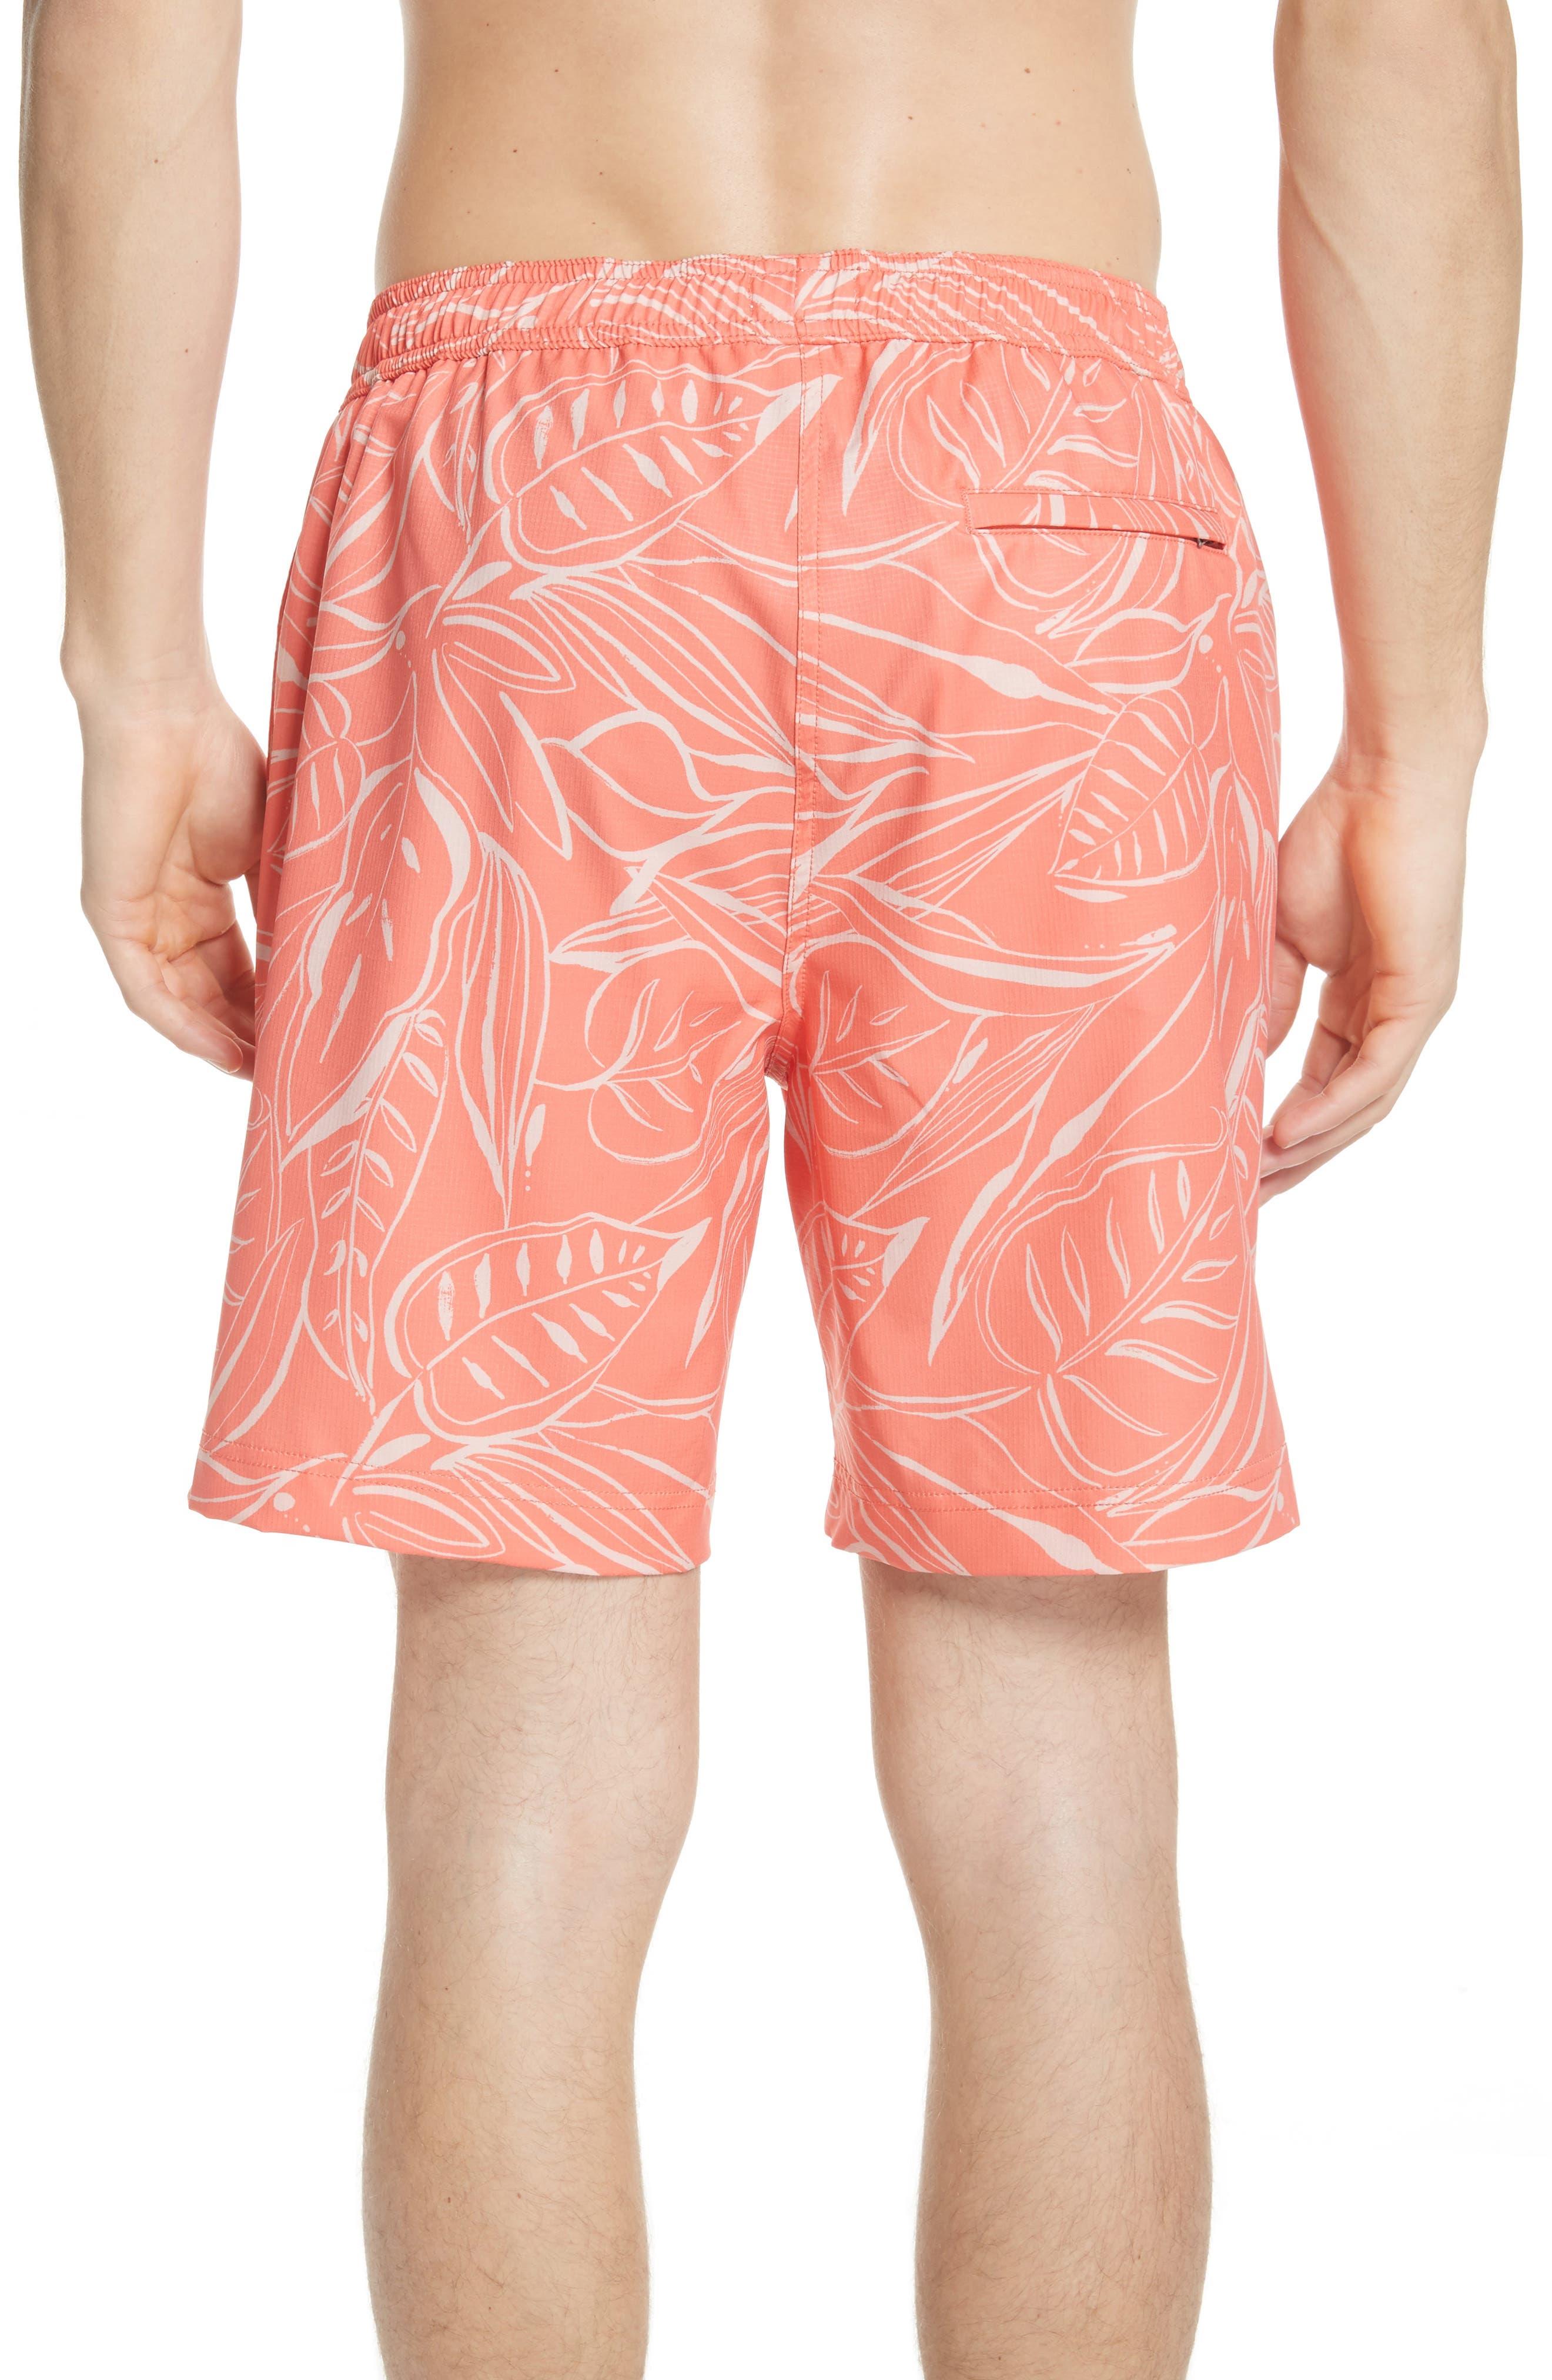 Charles Leaf Print Swim Trunks,                             Alternate thumbnail 2, color,                             Tangerine Coral